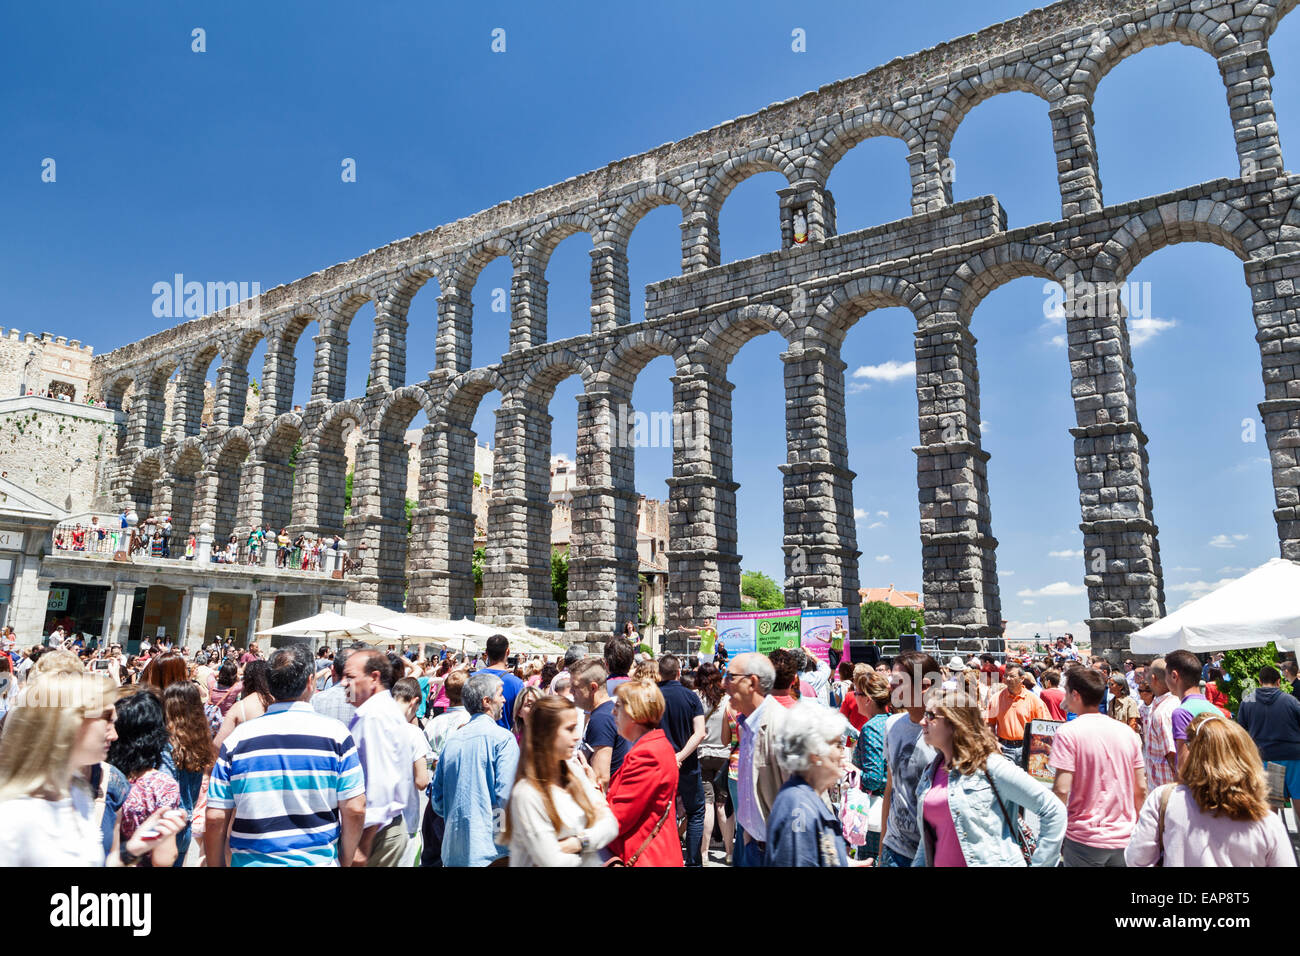 Music festival at the Roman Aqueduct. - Stock Image